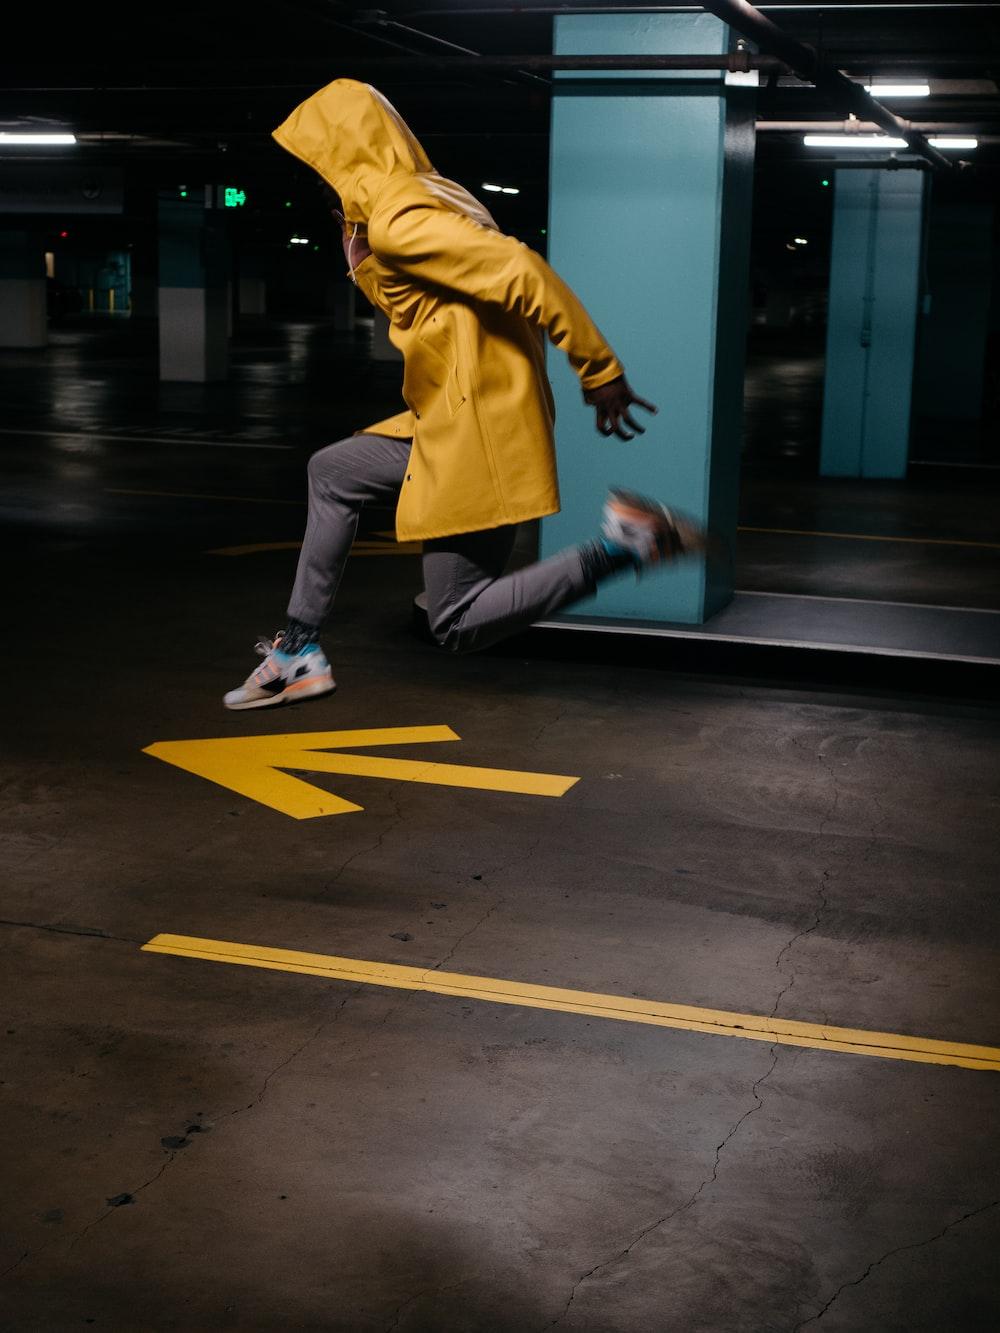 man in yellow long sleeve shirt and white pants walking on sidewalk